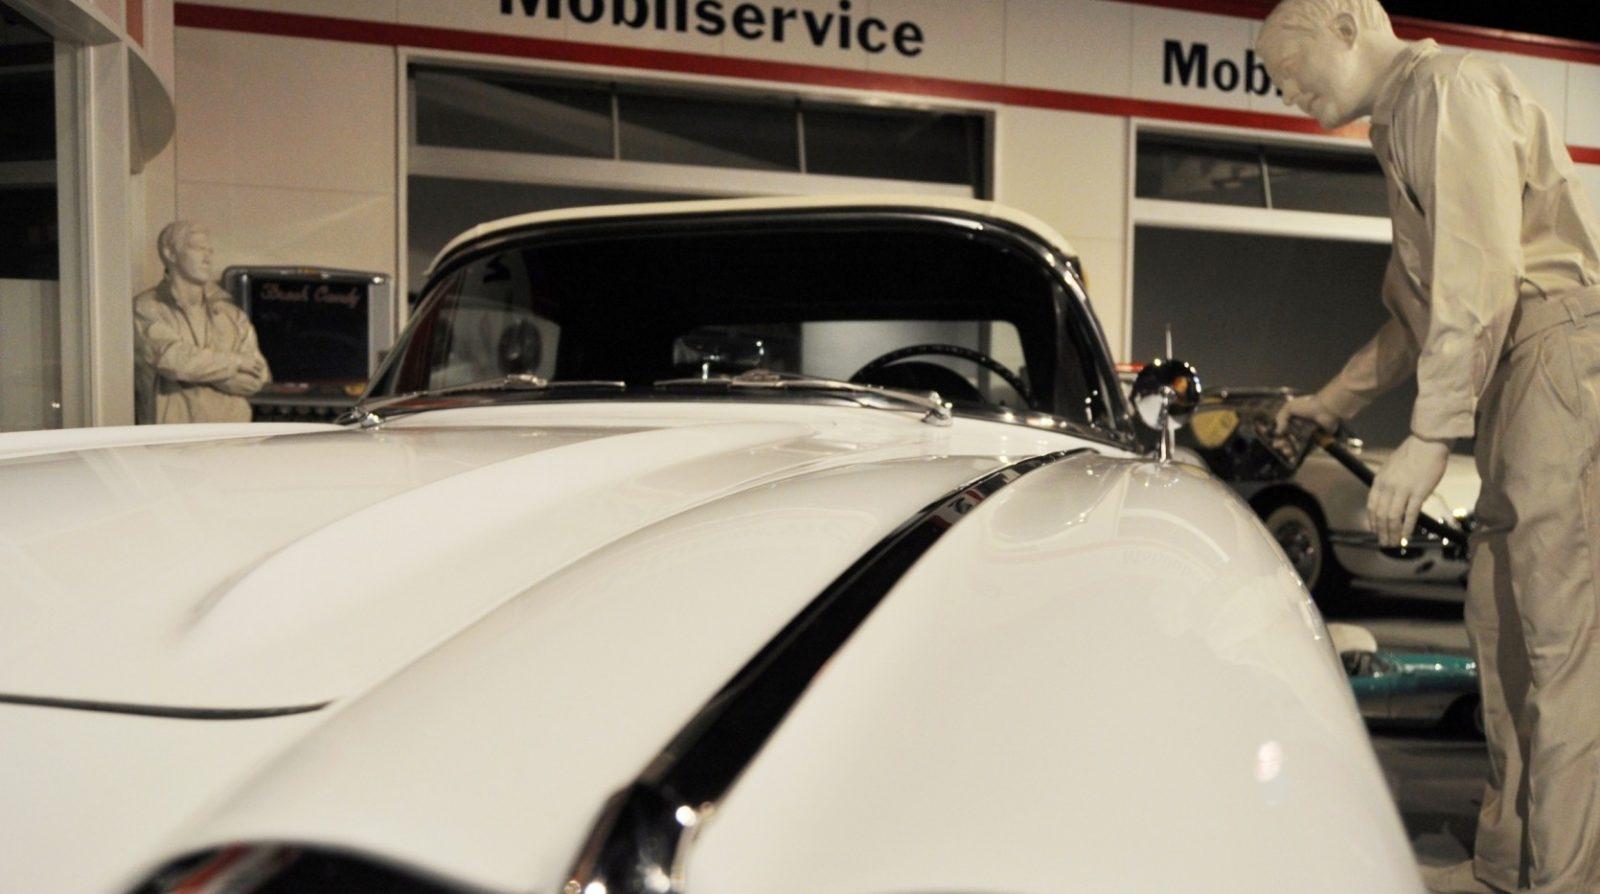 Corvette Museum Photo Tour -- The C1, C2 and C3 Generations in 83 High-Res Photos 60